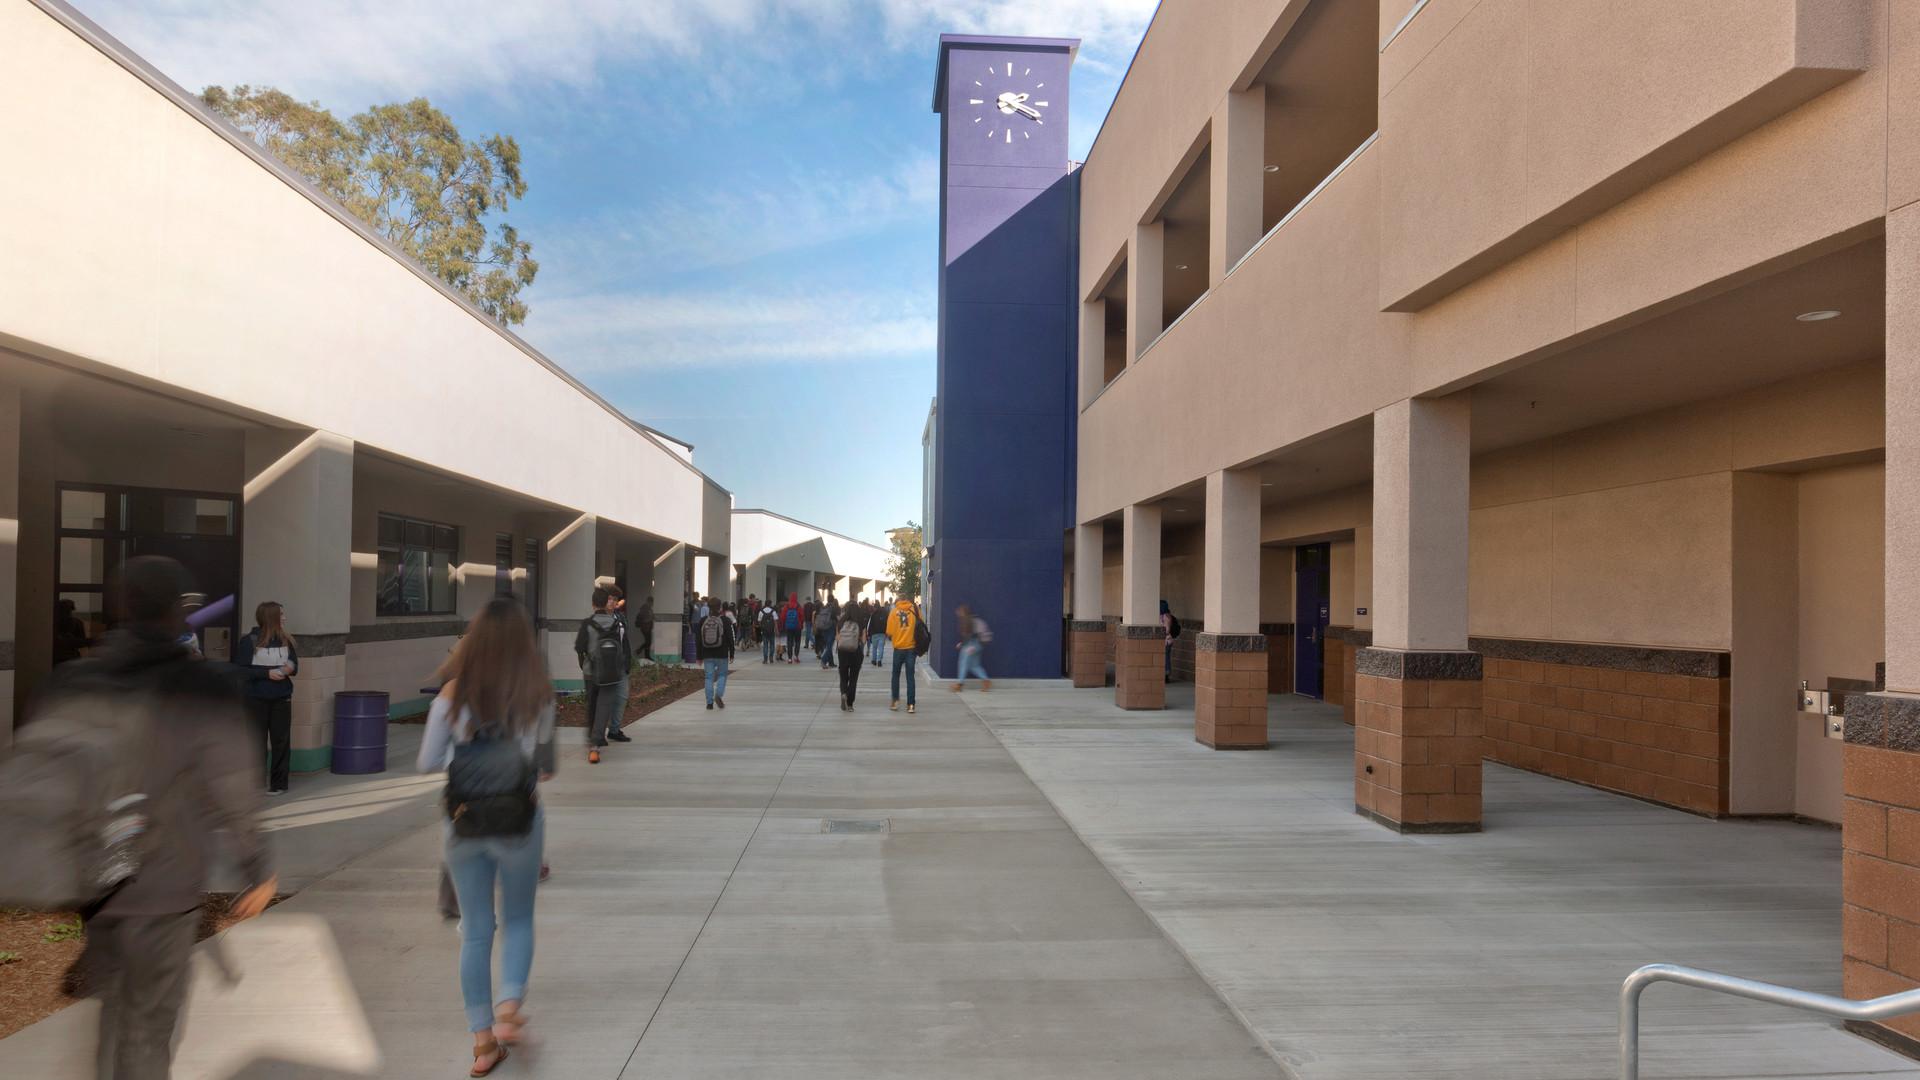 New Two-Story Classroom Building + Interim Housing, Rancho Cucamonga High School